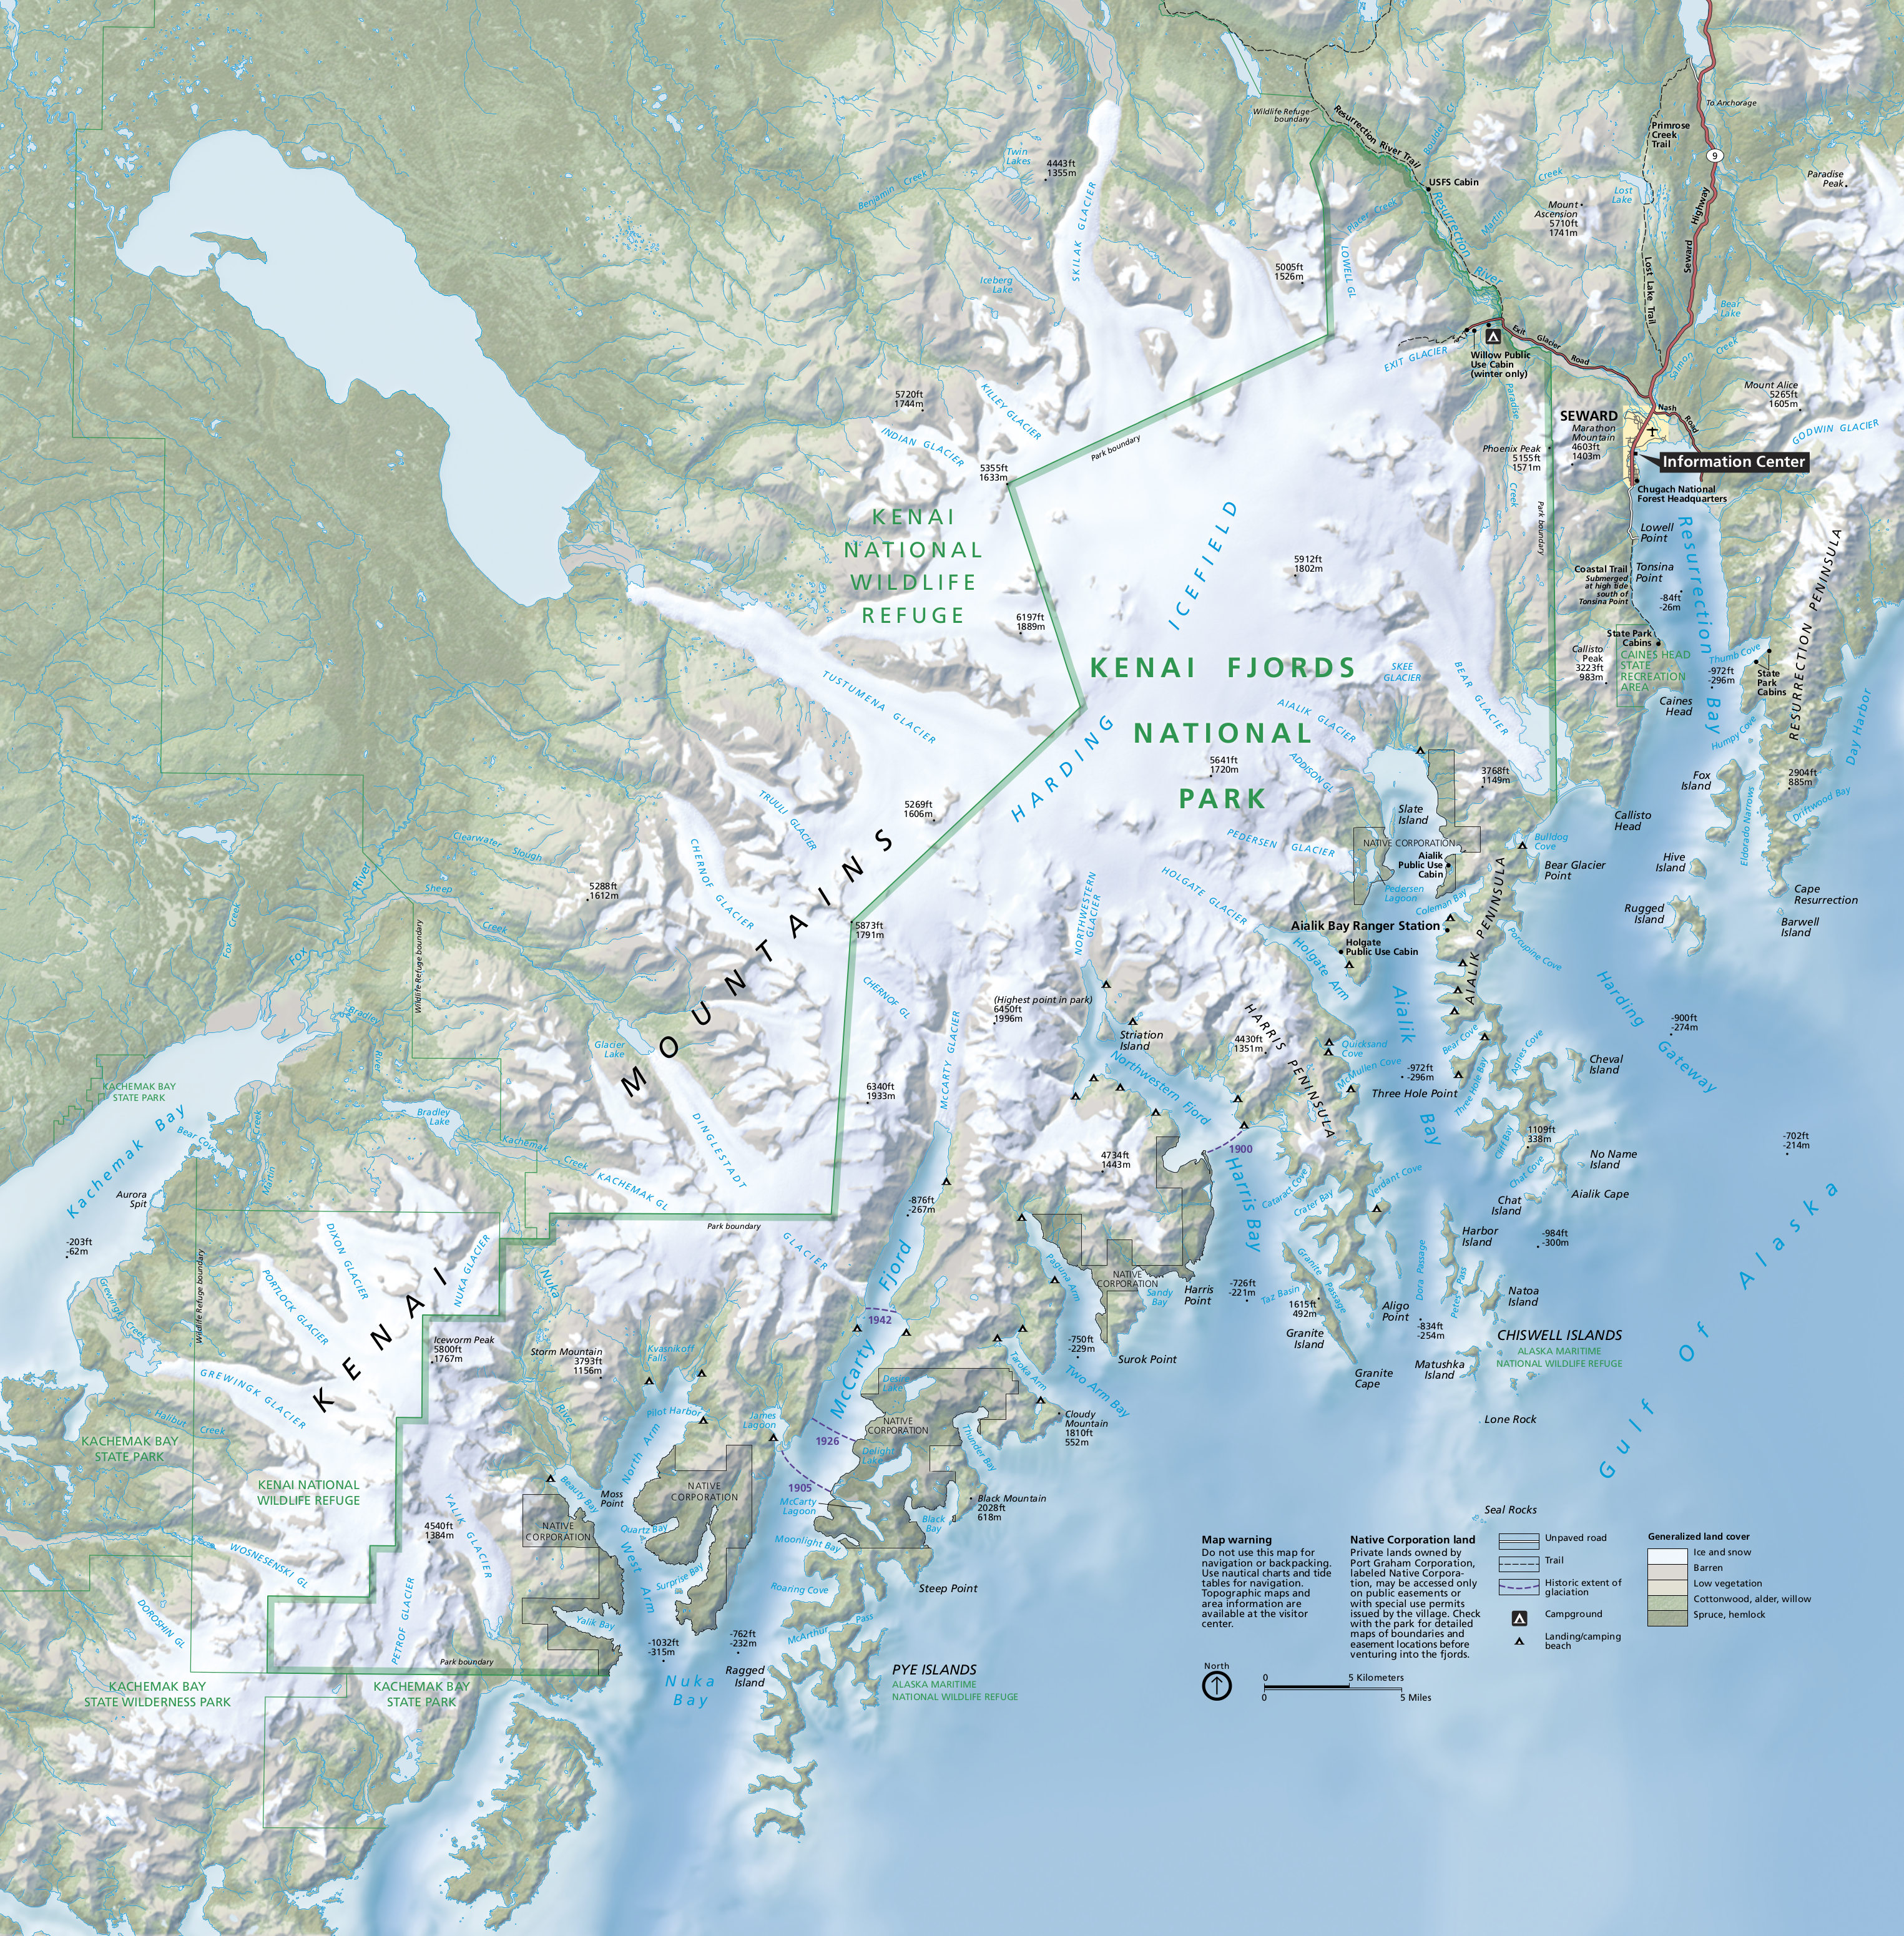 FileNPS kenaifjordsmapjpg Wikimedia Commons